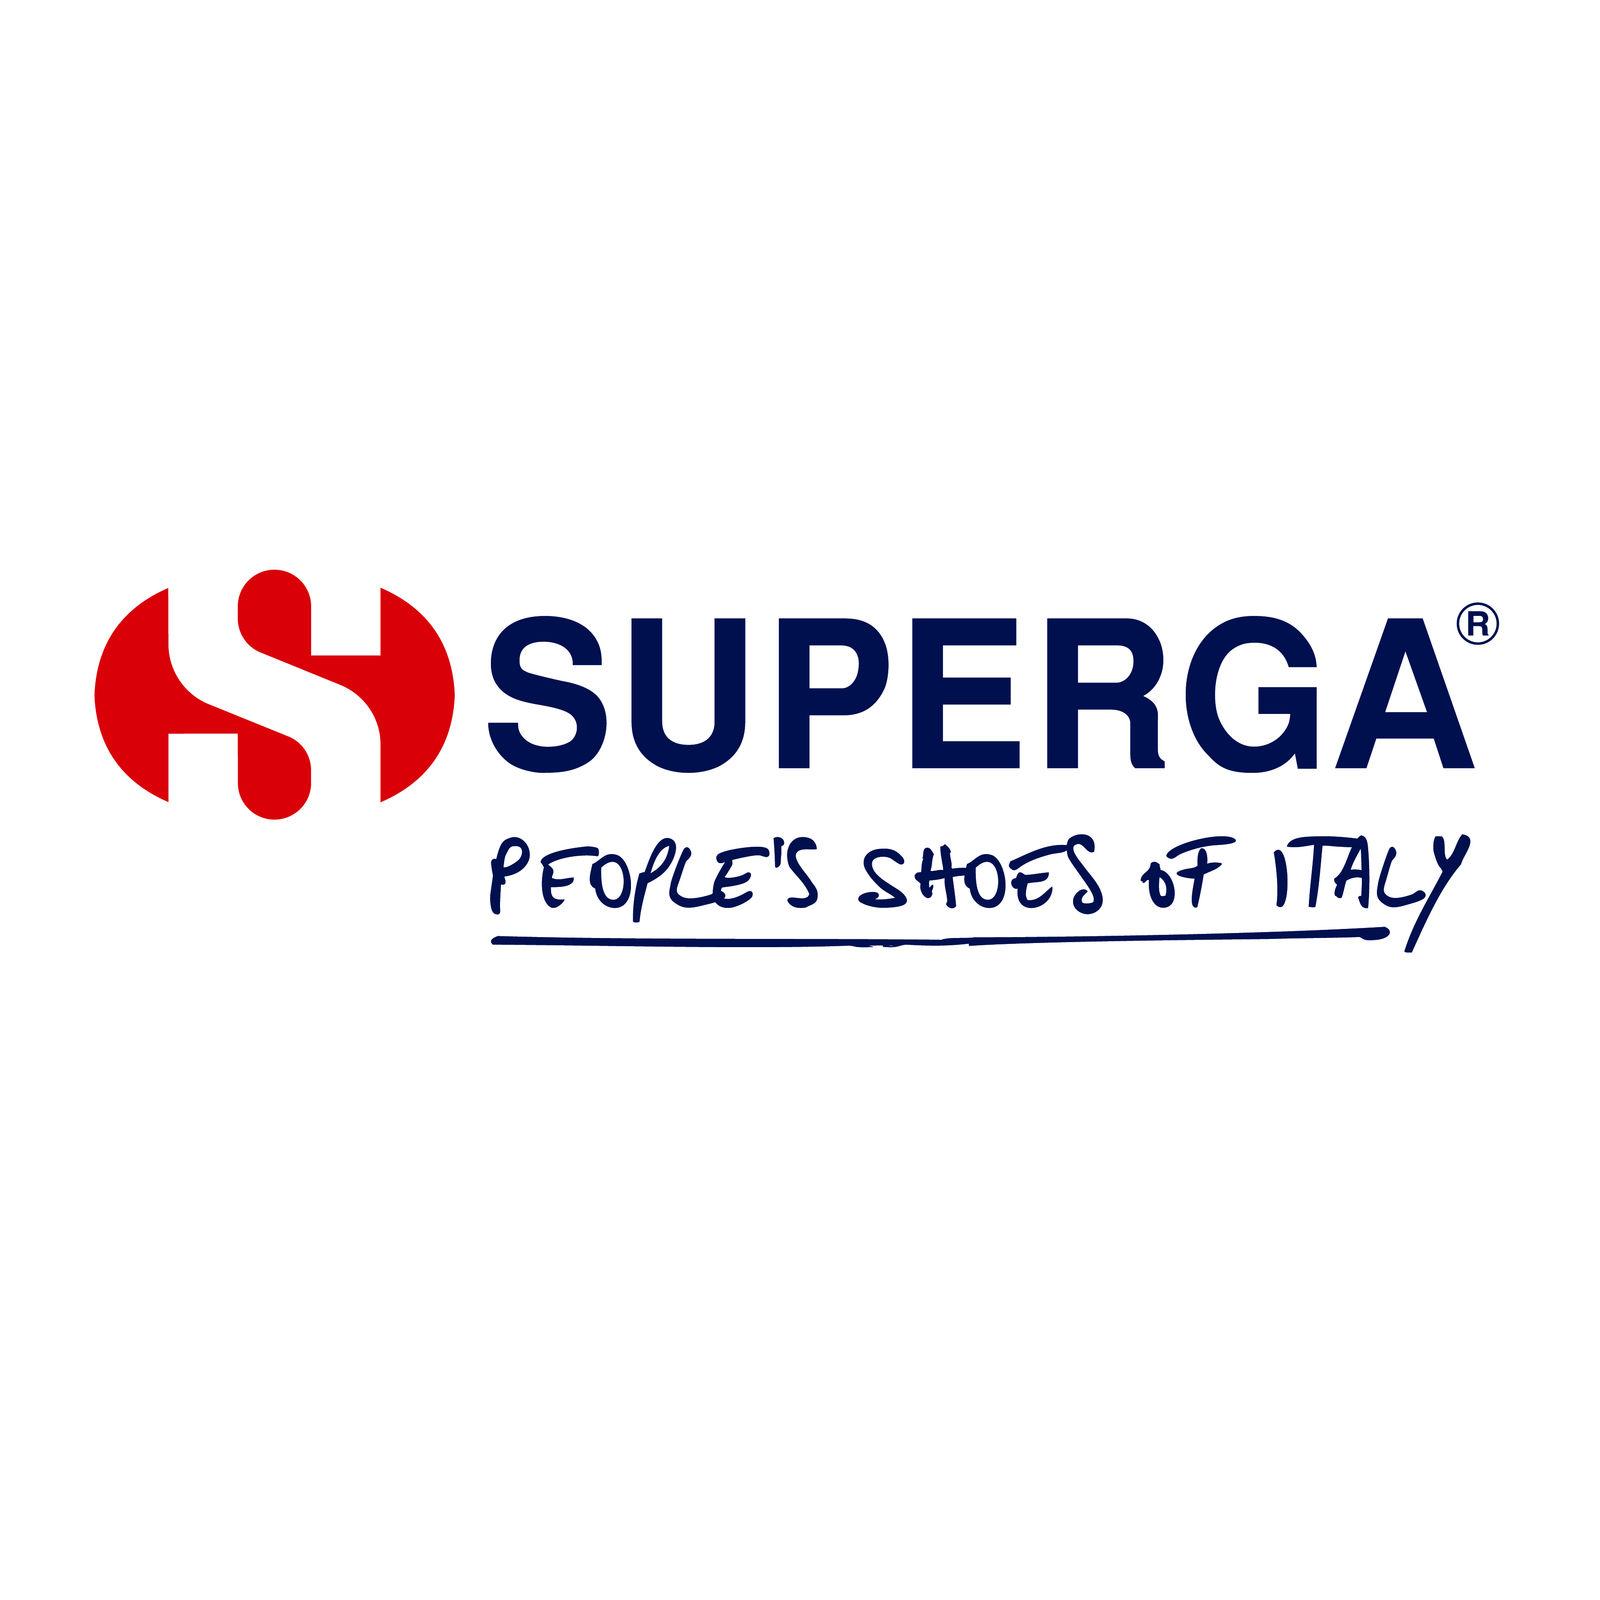 SUPERGA® (Image 1)